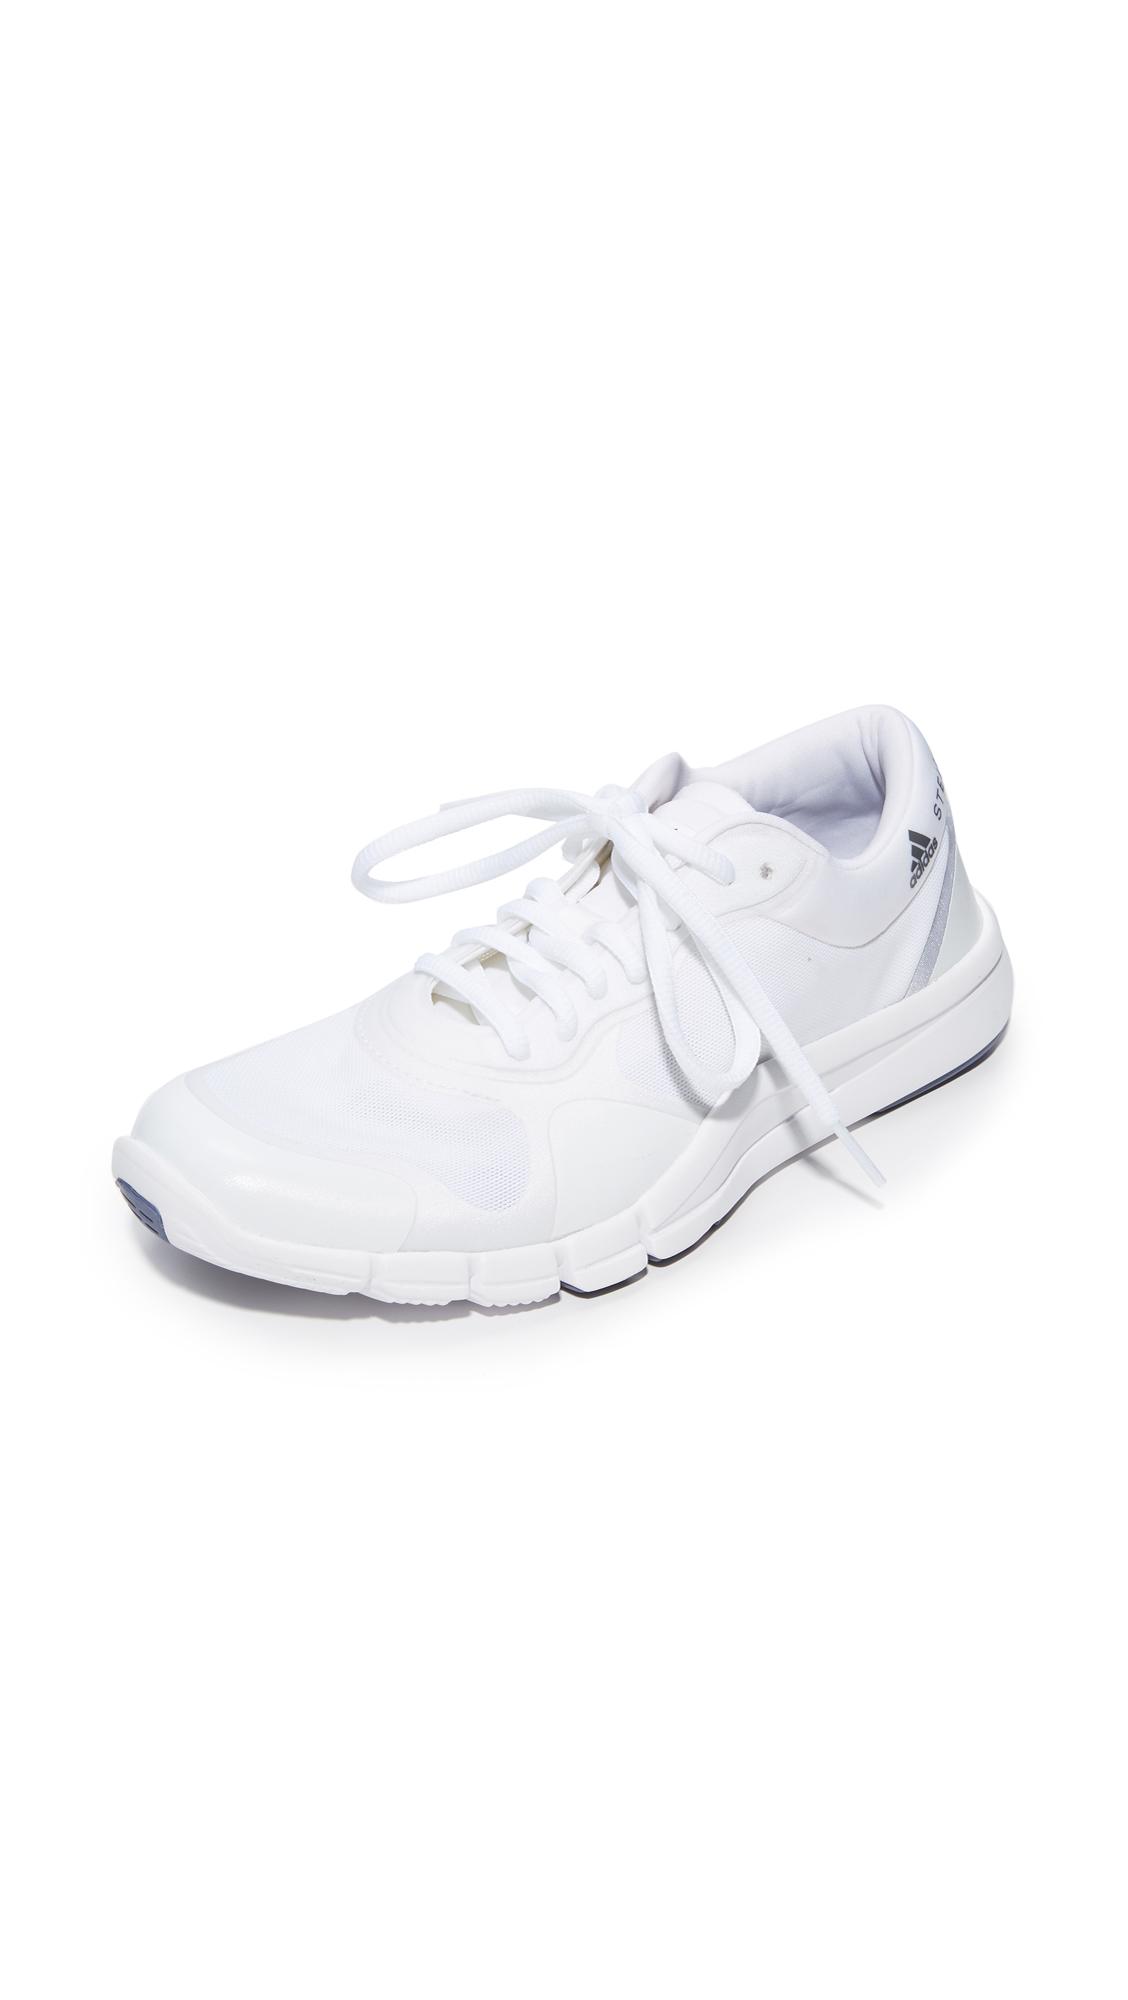 adidas by Stella McCartney Adipure Sneakers - Ftwr White/Ftwr White/Purple